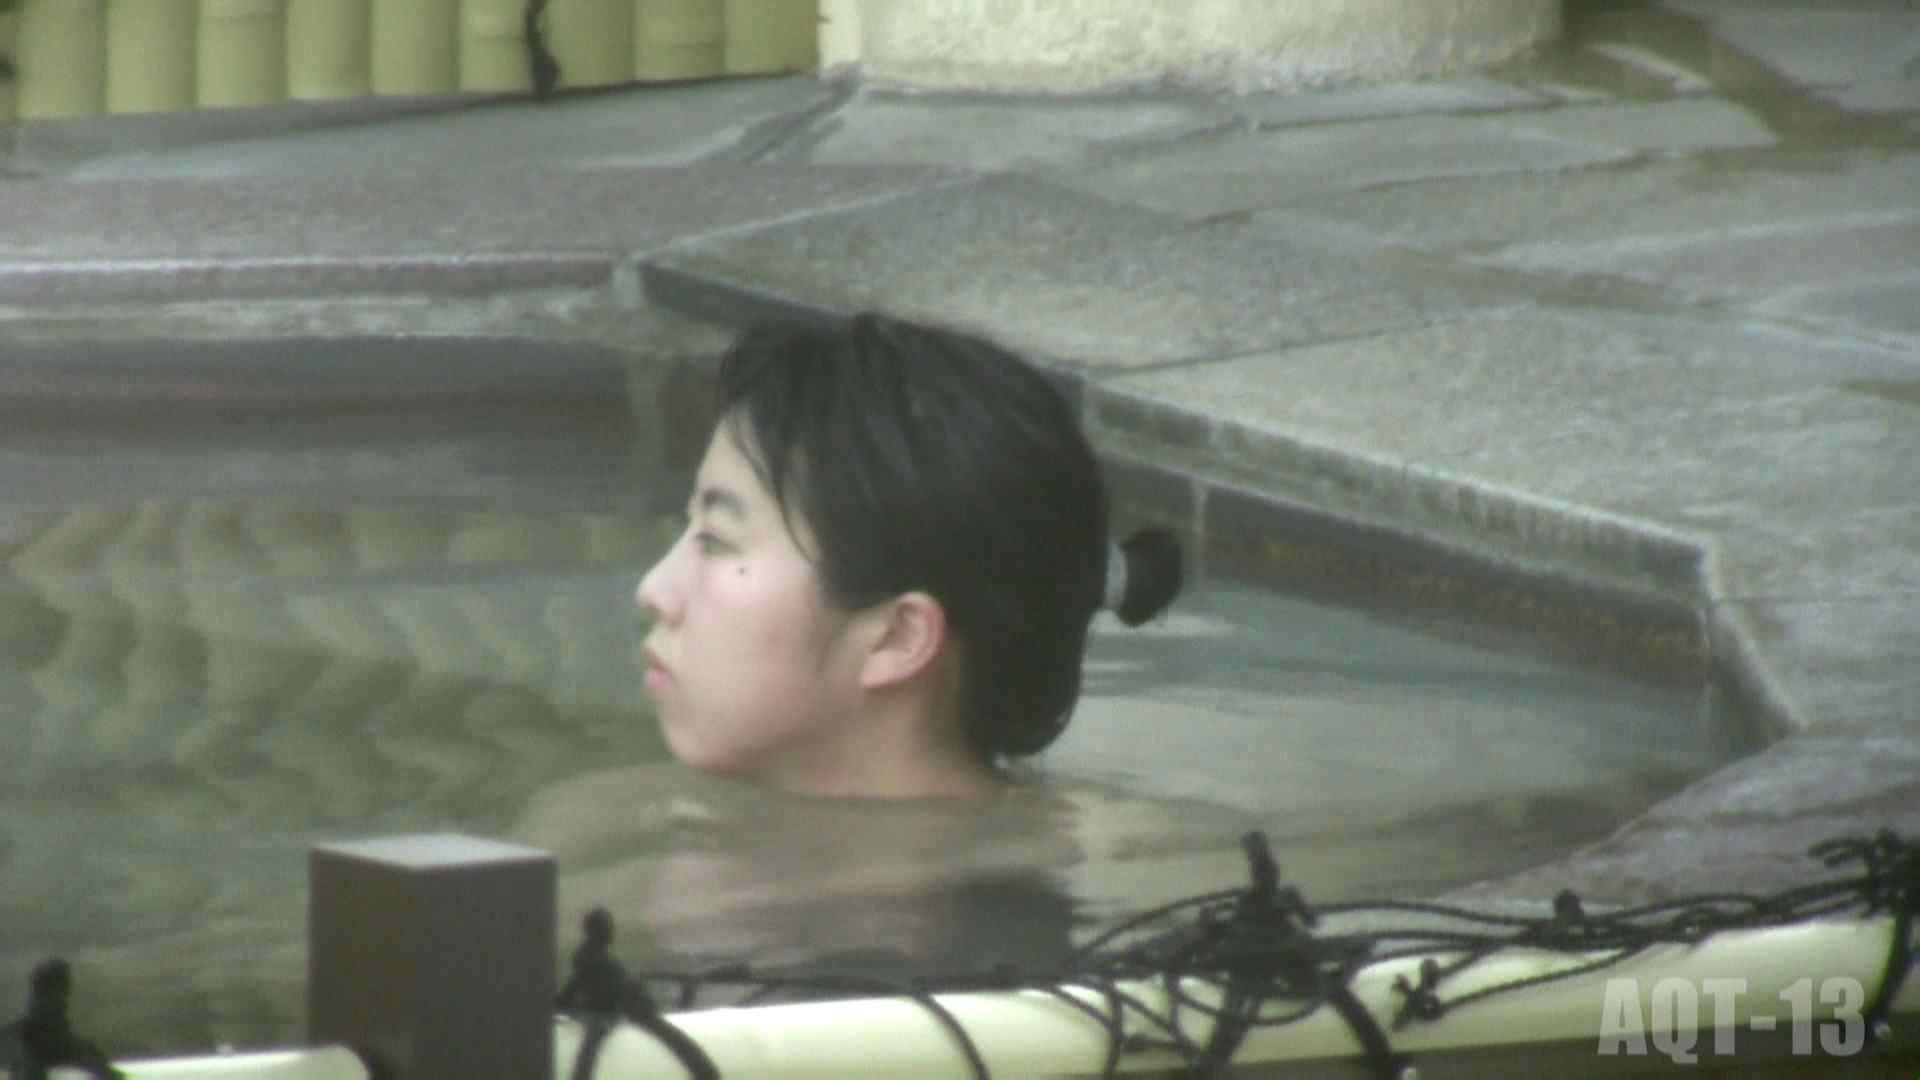 Aquaな露天風呂Vol.816 OLのエロ生活 | 露天風呂  90連発 28